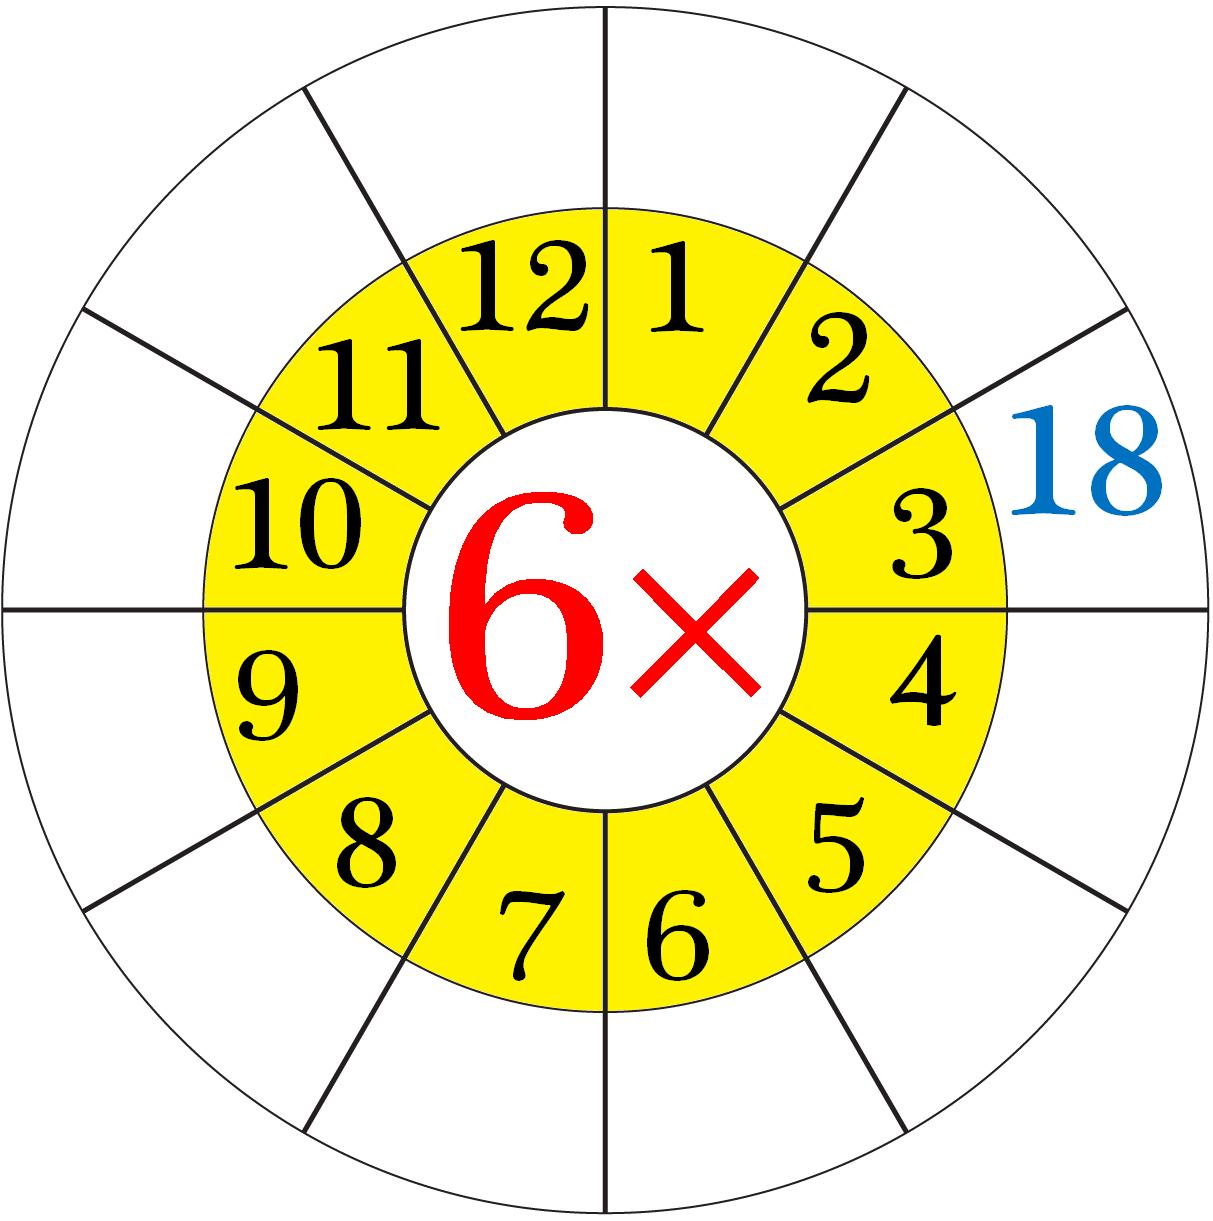 Worksheet on Multiplication Table of 6 matem tiques – 6 Multiplication Worksheet